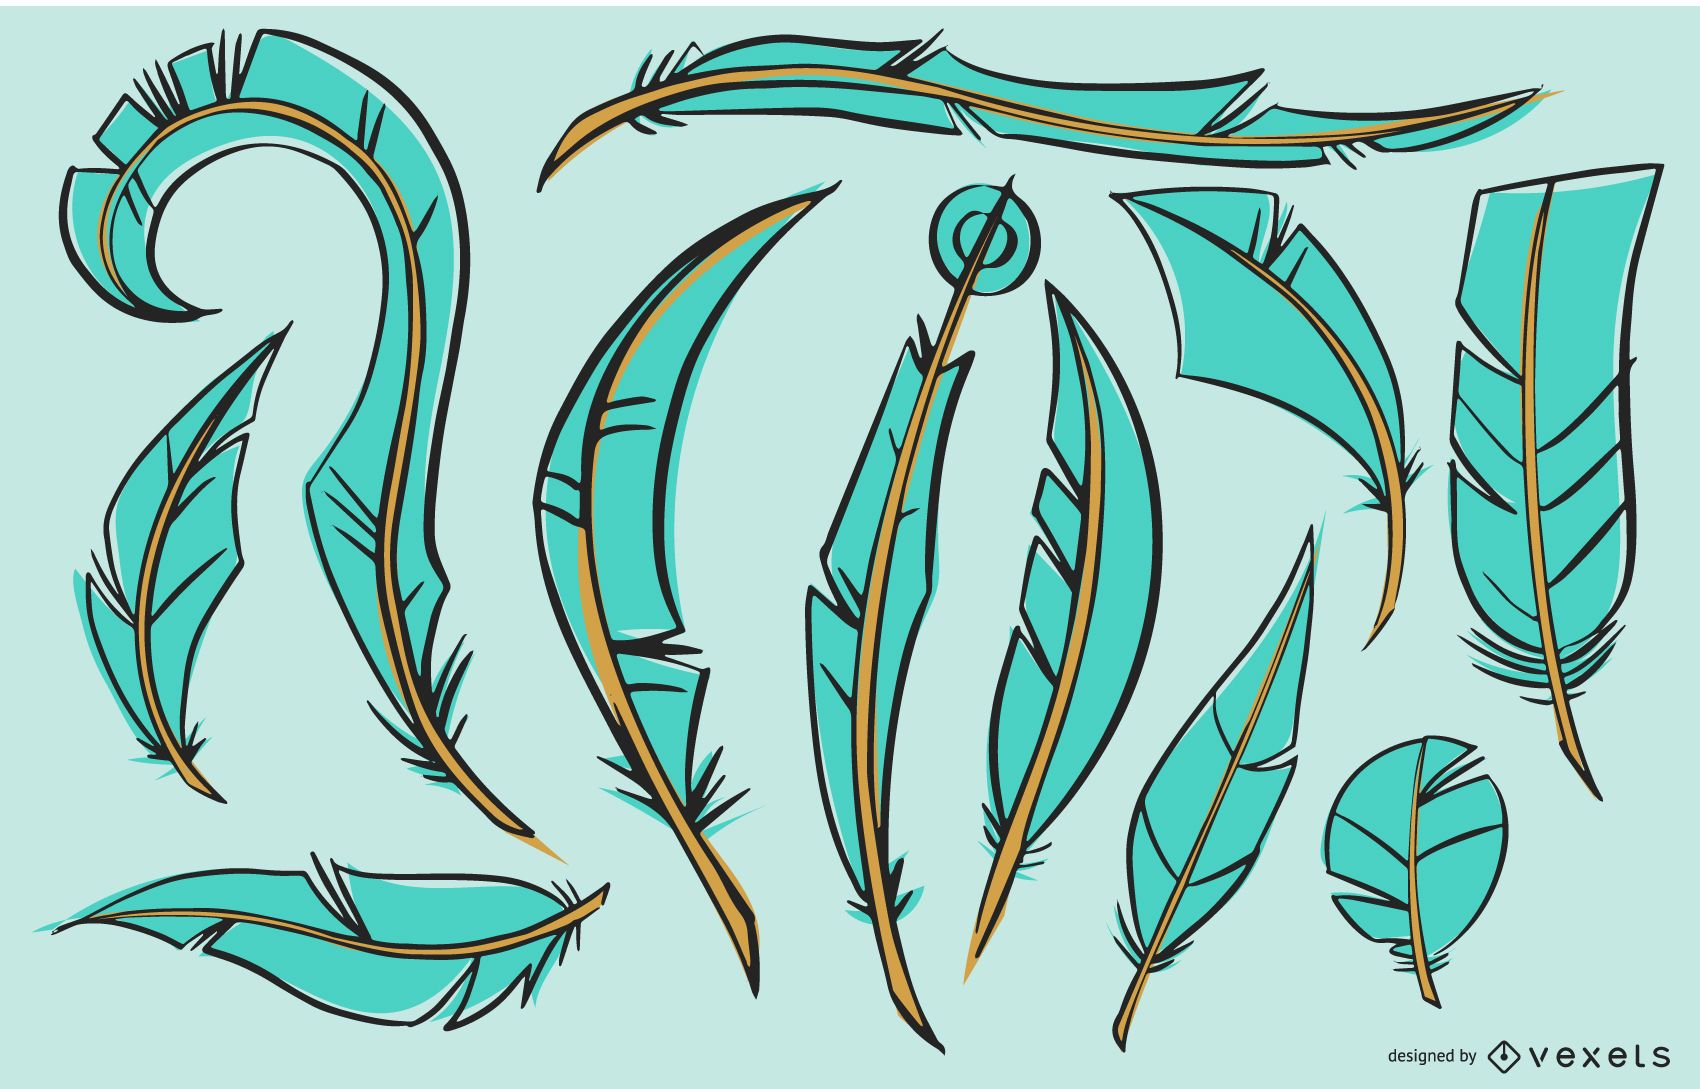 Cyan Bird Feather Illustration Pack